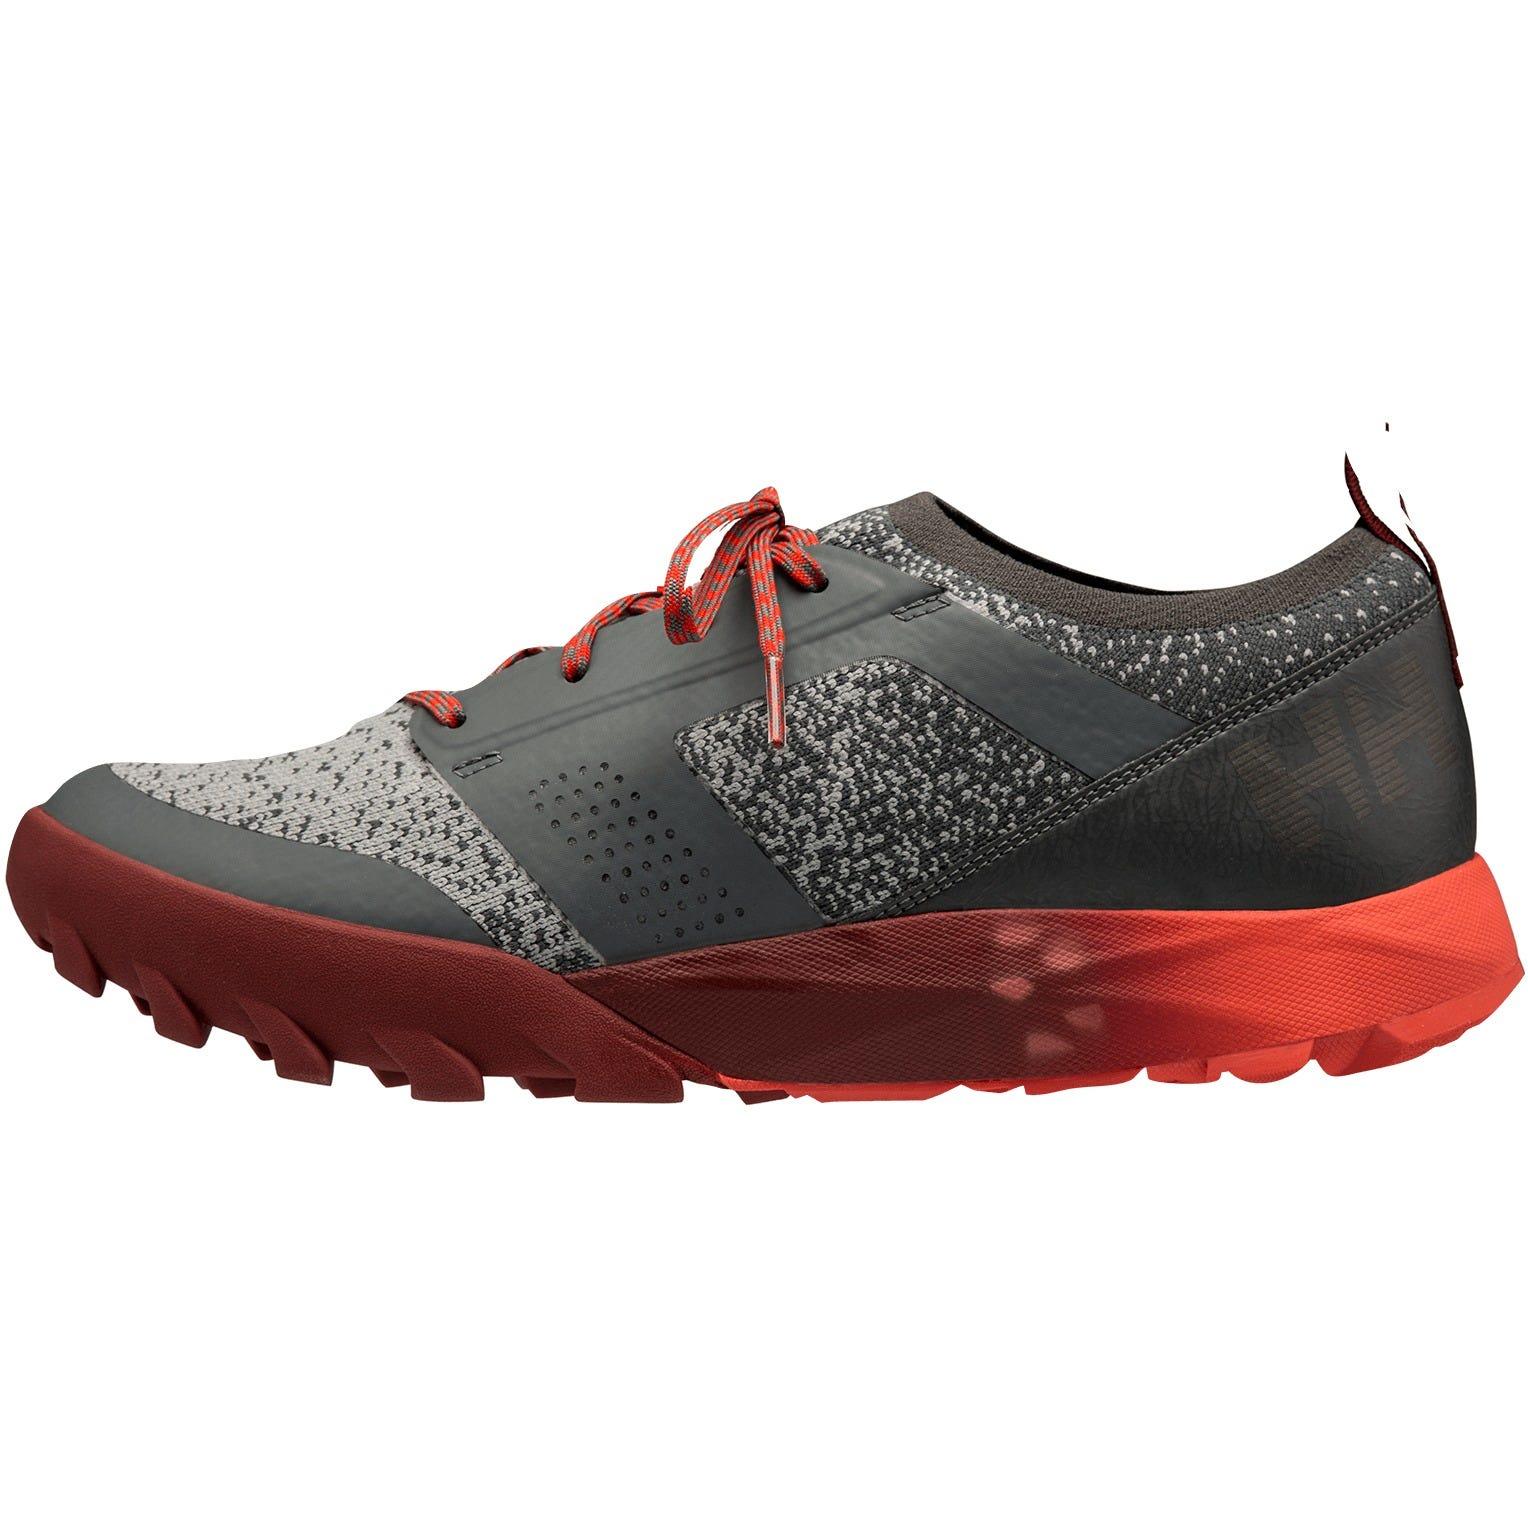 Helly Hansen Loke Dash Mens Hiking Boot Blue 44.5/10.5